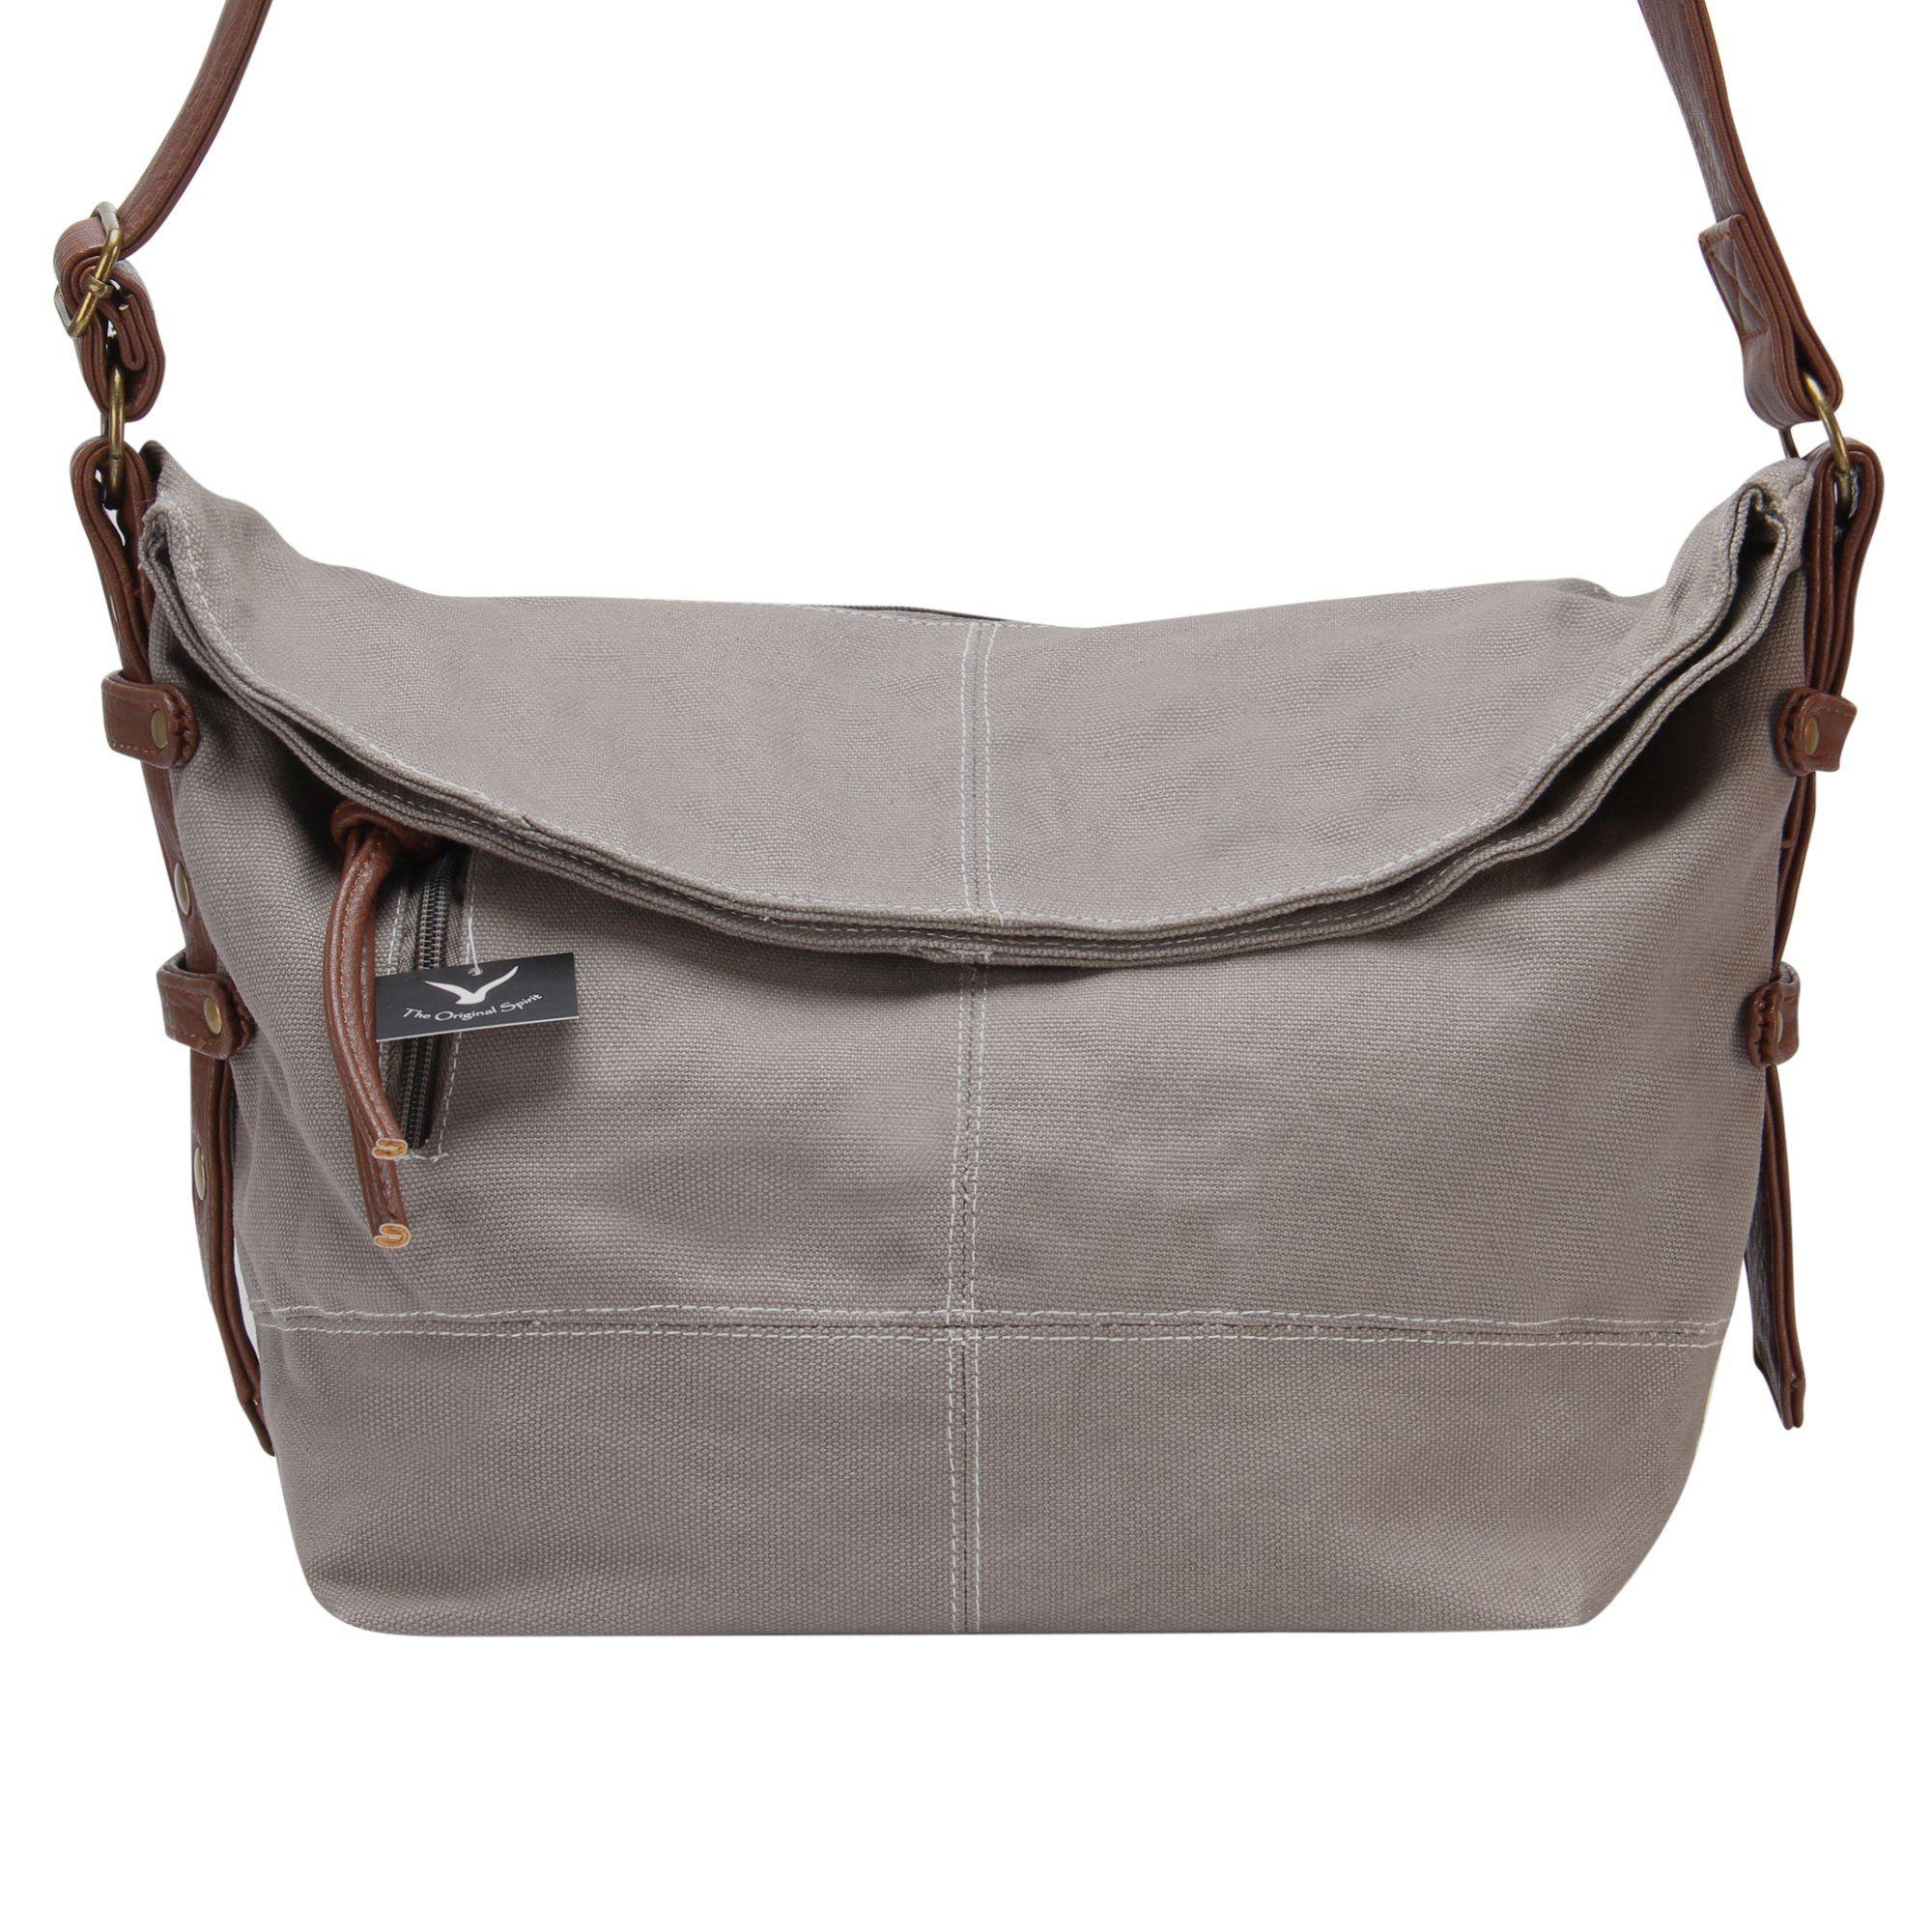 d443eec7ce Hynes Eagle Leisure Fashion Style Canvas Cross Body Tote Hobo Bag (Grey)